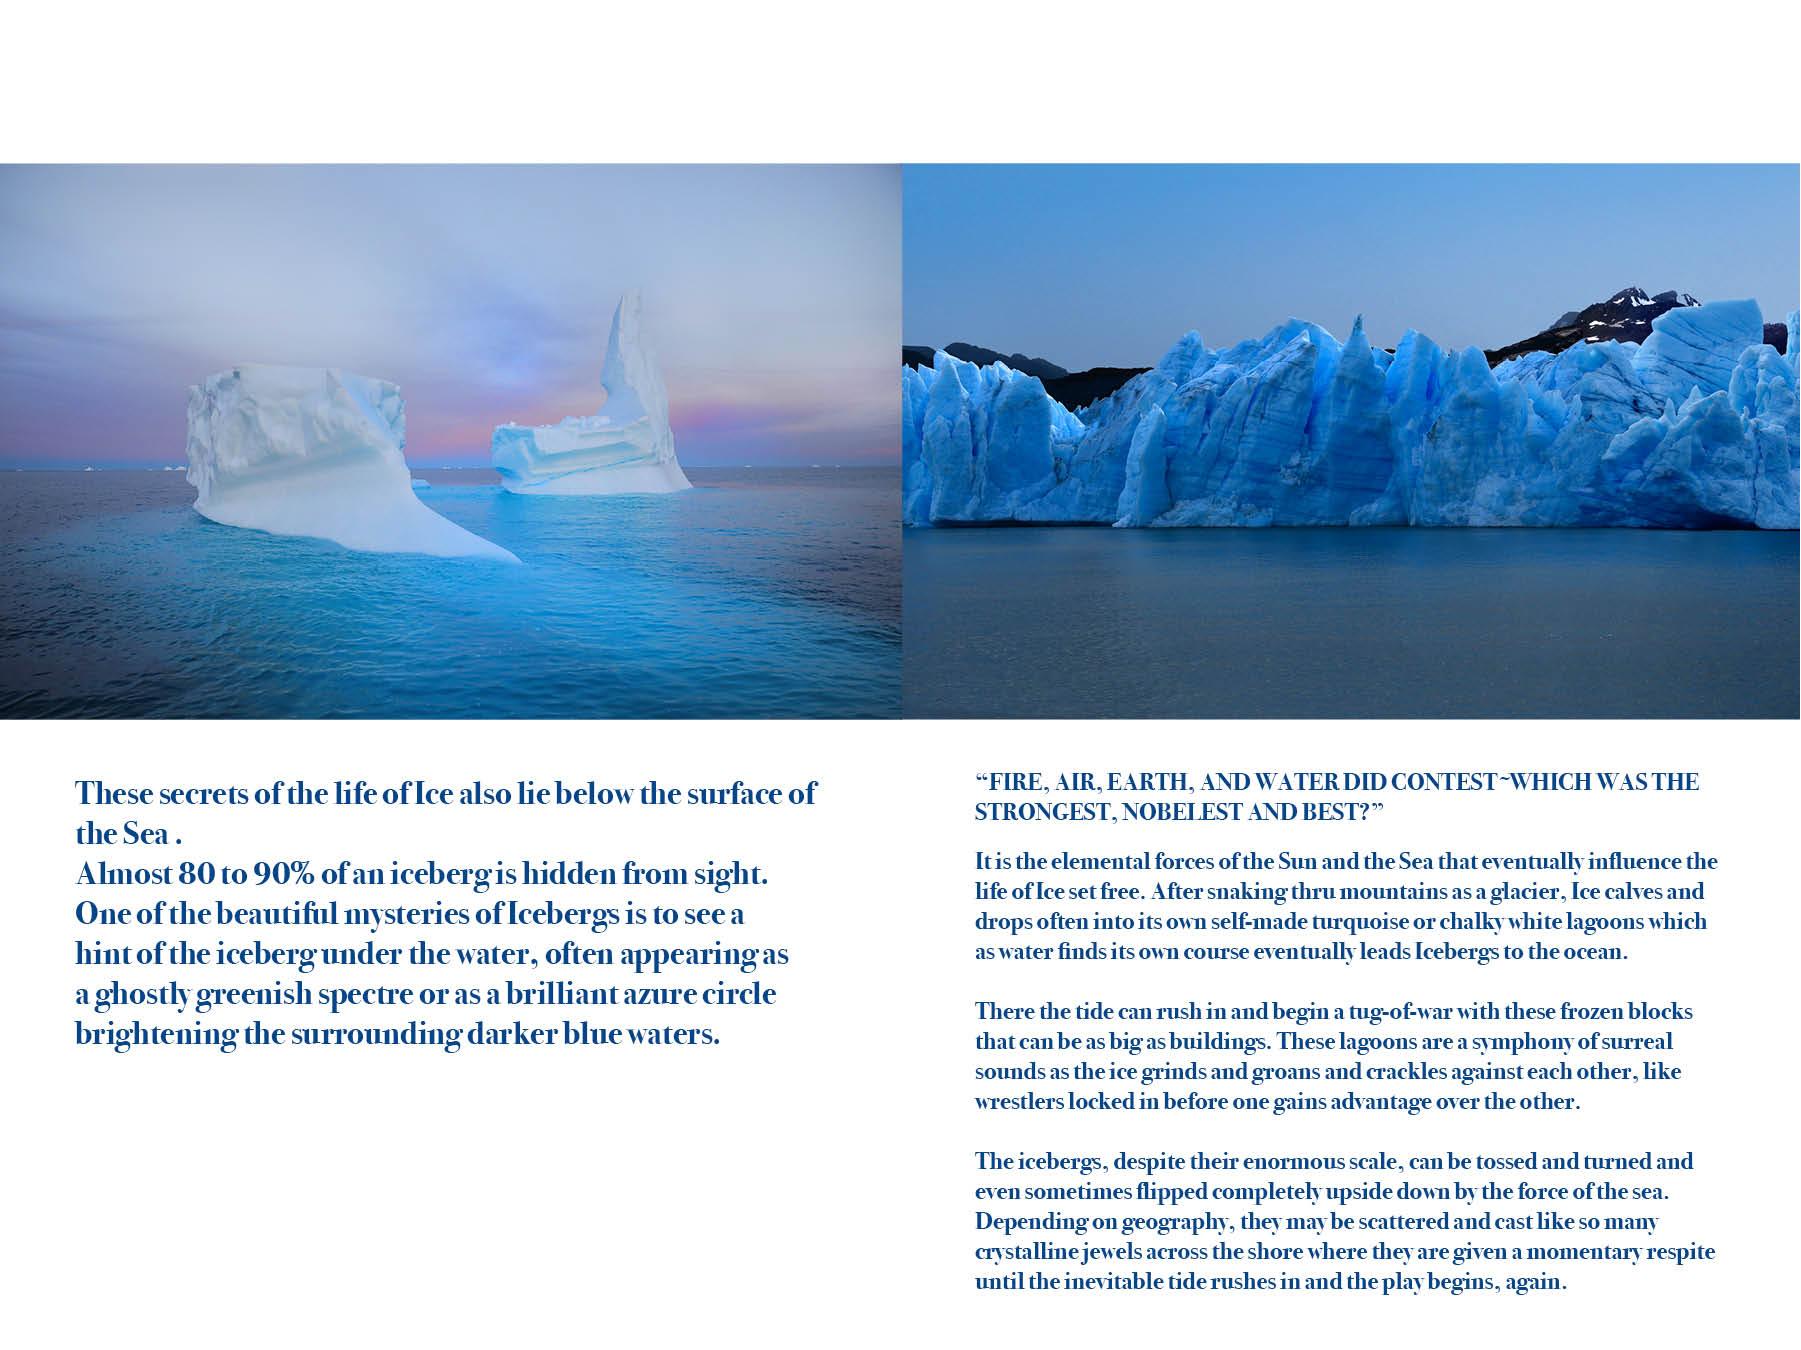 Sailing_Thru_Icebergs_article_9.jpg